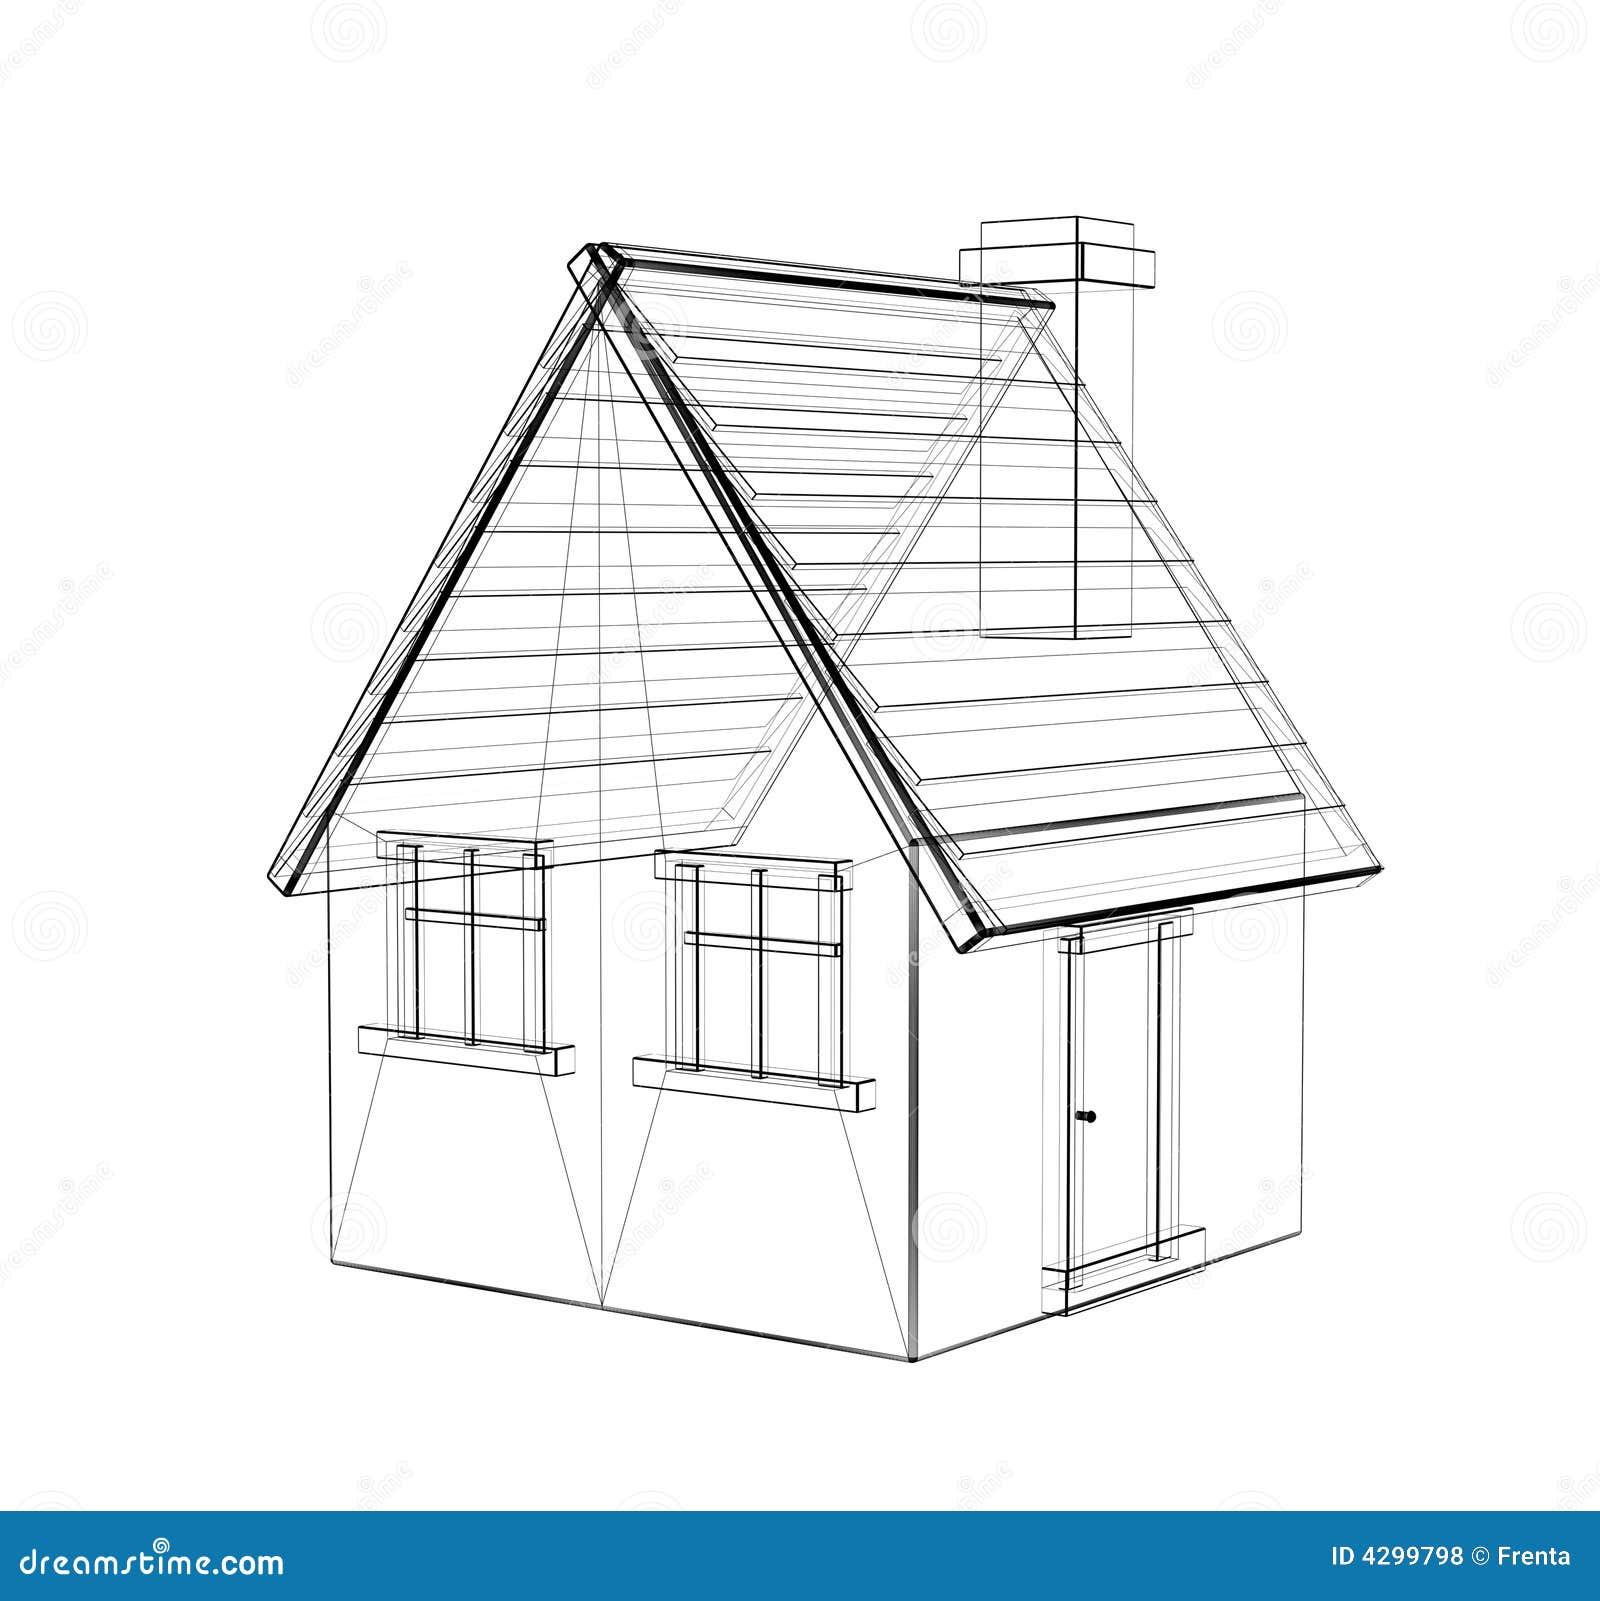 Huis Anubis Kleurplaten Printen.Huis Anubis Kleurplaat Het Huis Anubis Het Pad Der 7 Zonden Het Huis